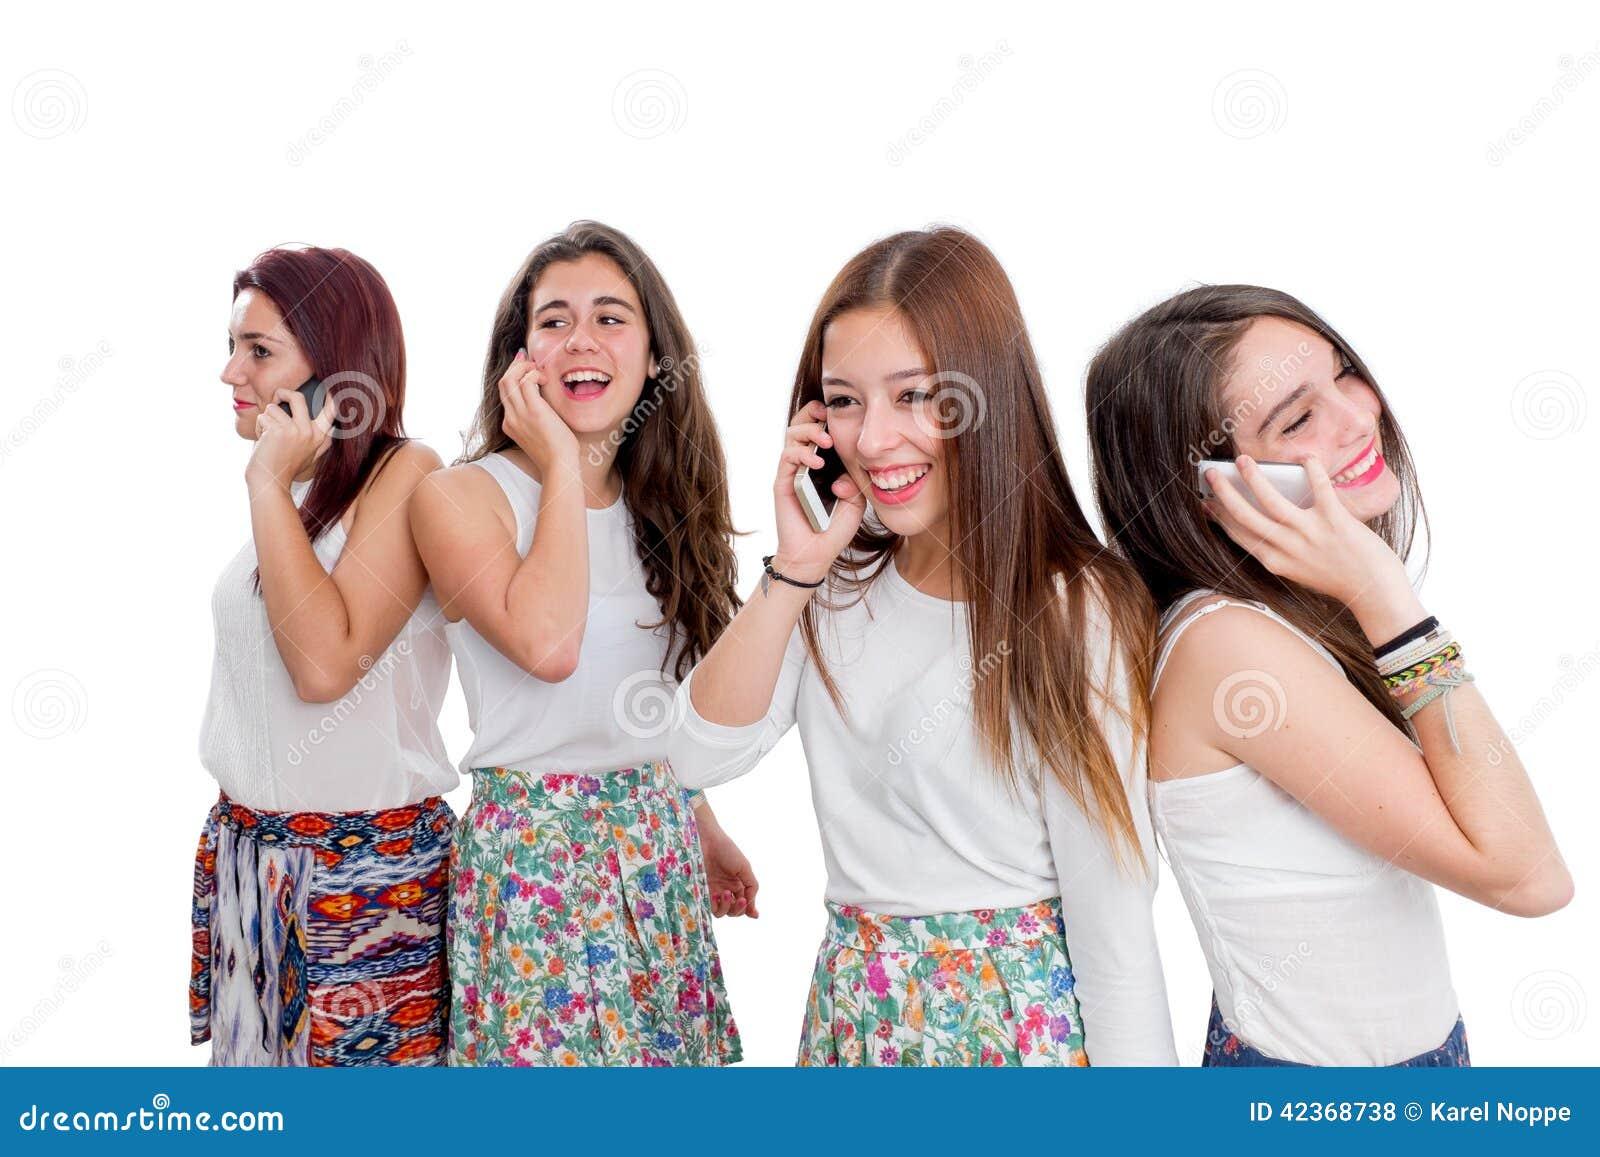 Group Teen Pics 7